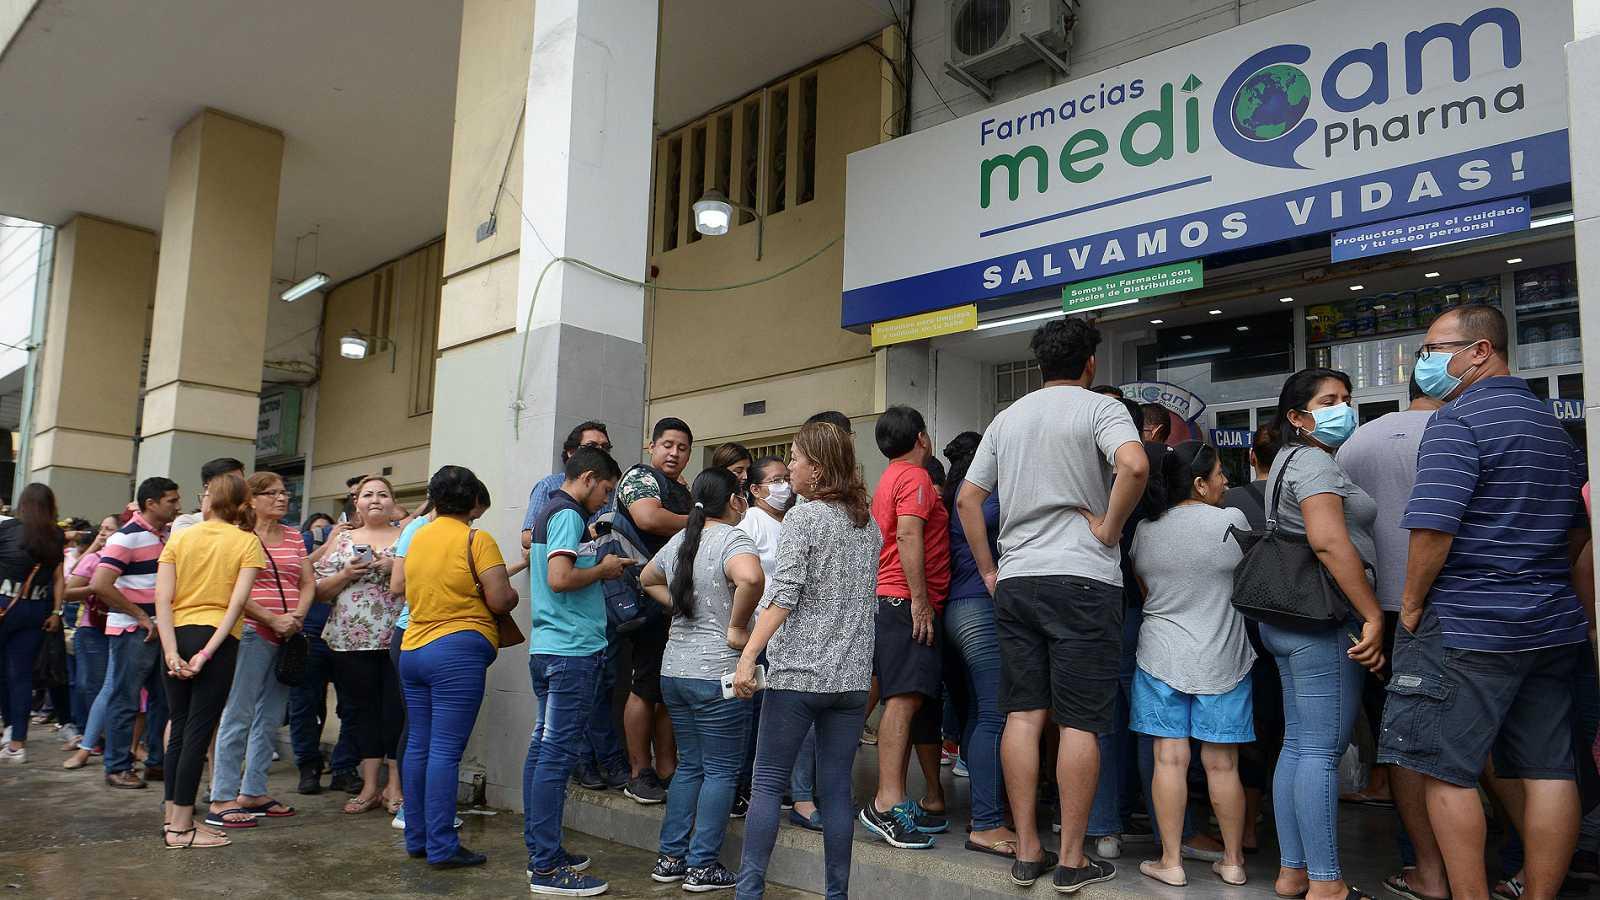 Coronavirus: Casos en Latinoamérica y España van en aumento; Irán en crisis con más de 200 fallecidos